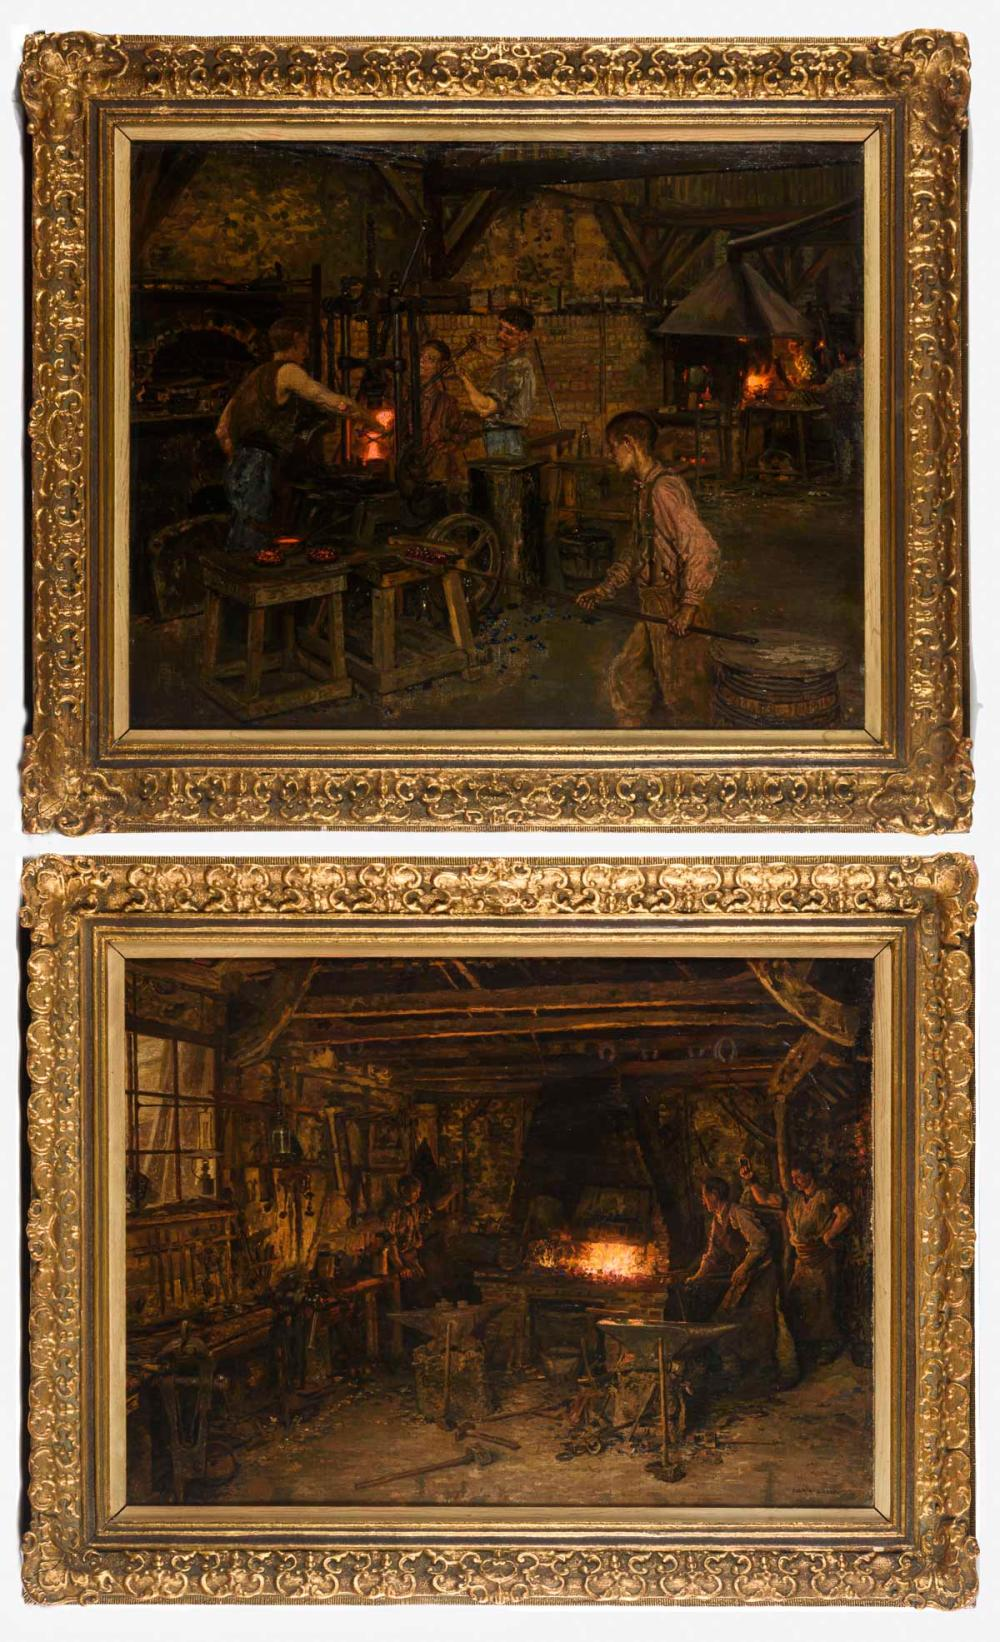 FIRMIN-GIRARD, François-Marie (1838 Poncin - 1921 Montluçon). Zwei Industriegemälde.